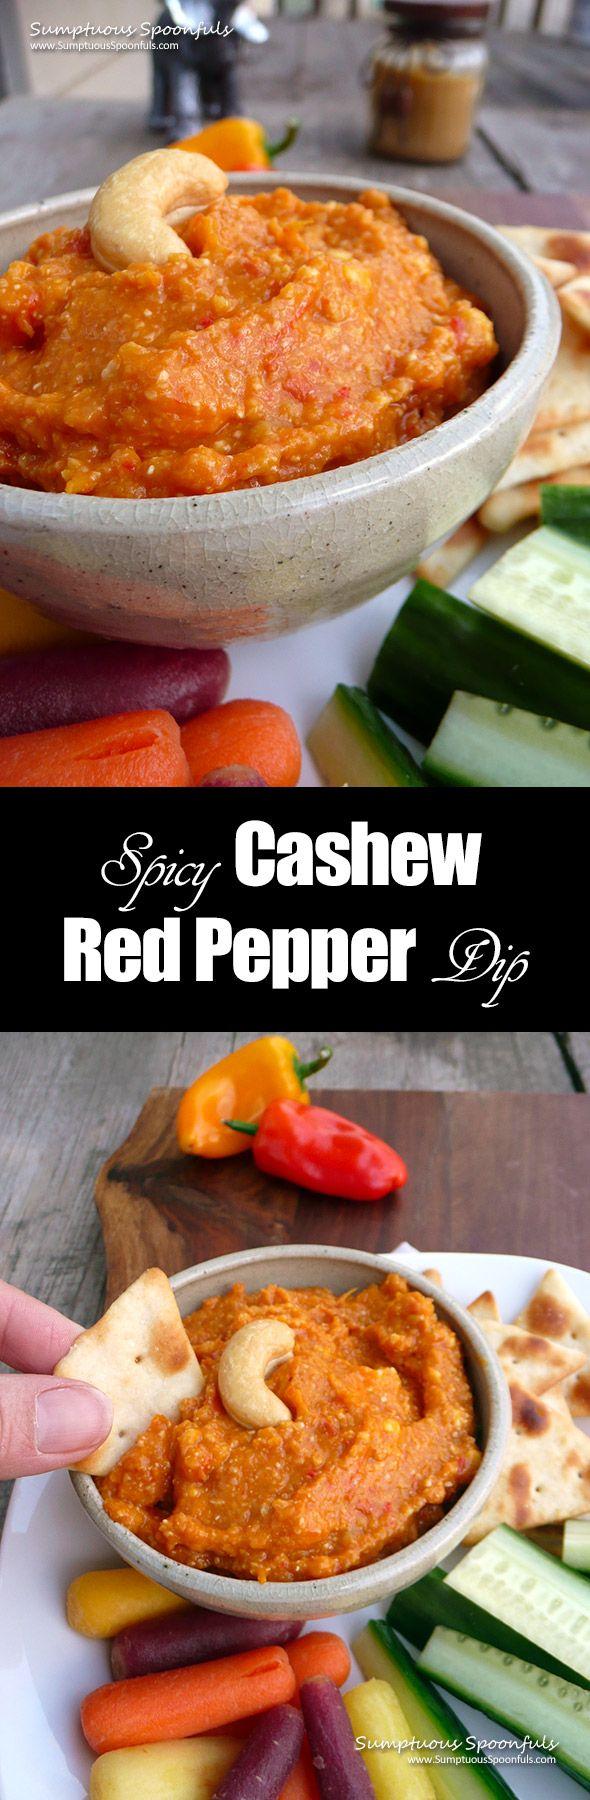 Spicy Cashew Red Pepper Dip ~ Sumptuous Spoonfuls #healthy #hot #pepper #dip #recipe